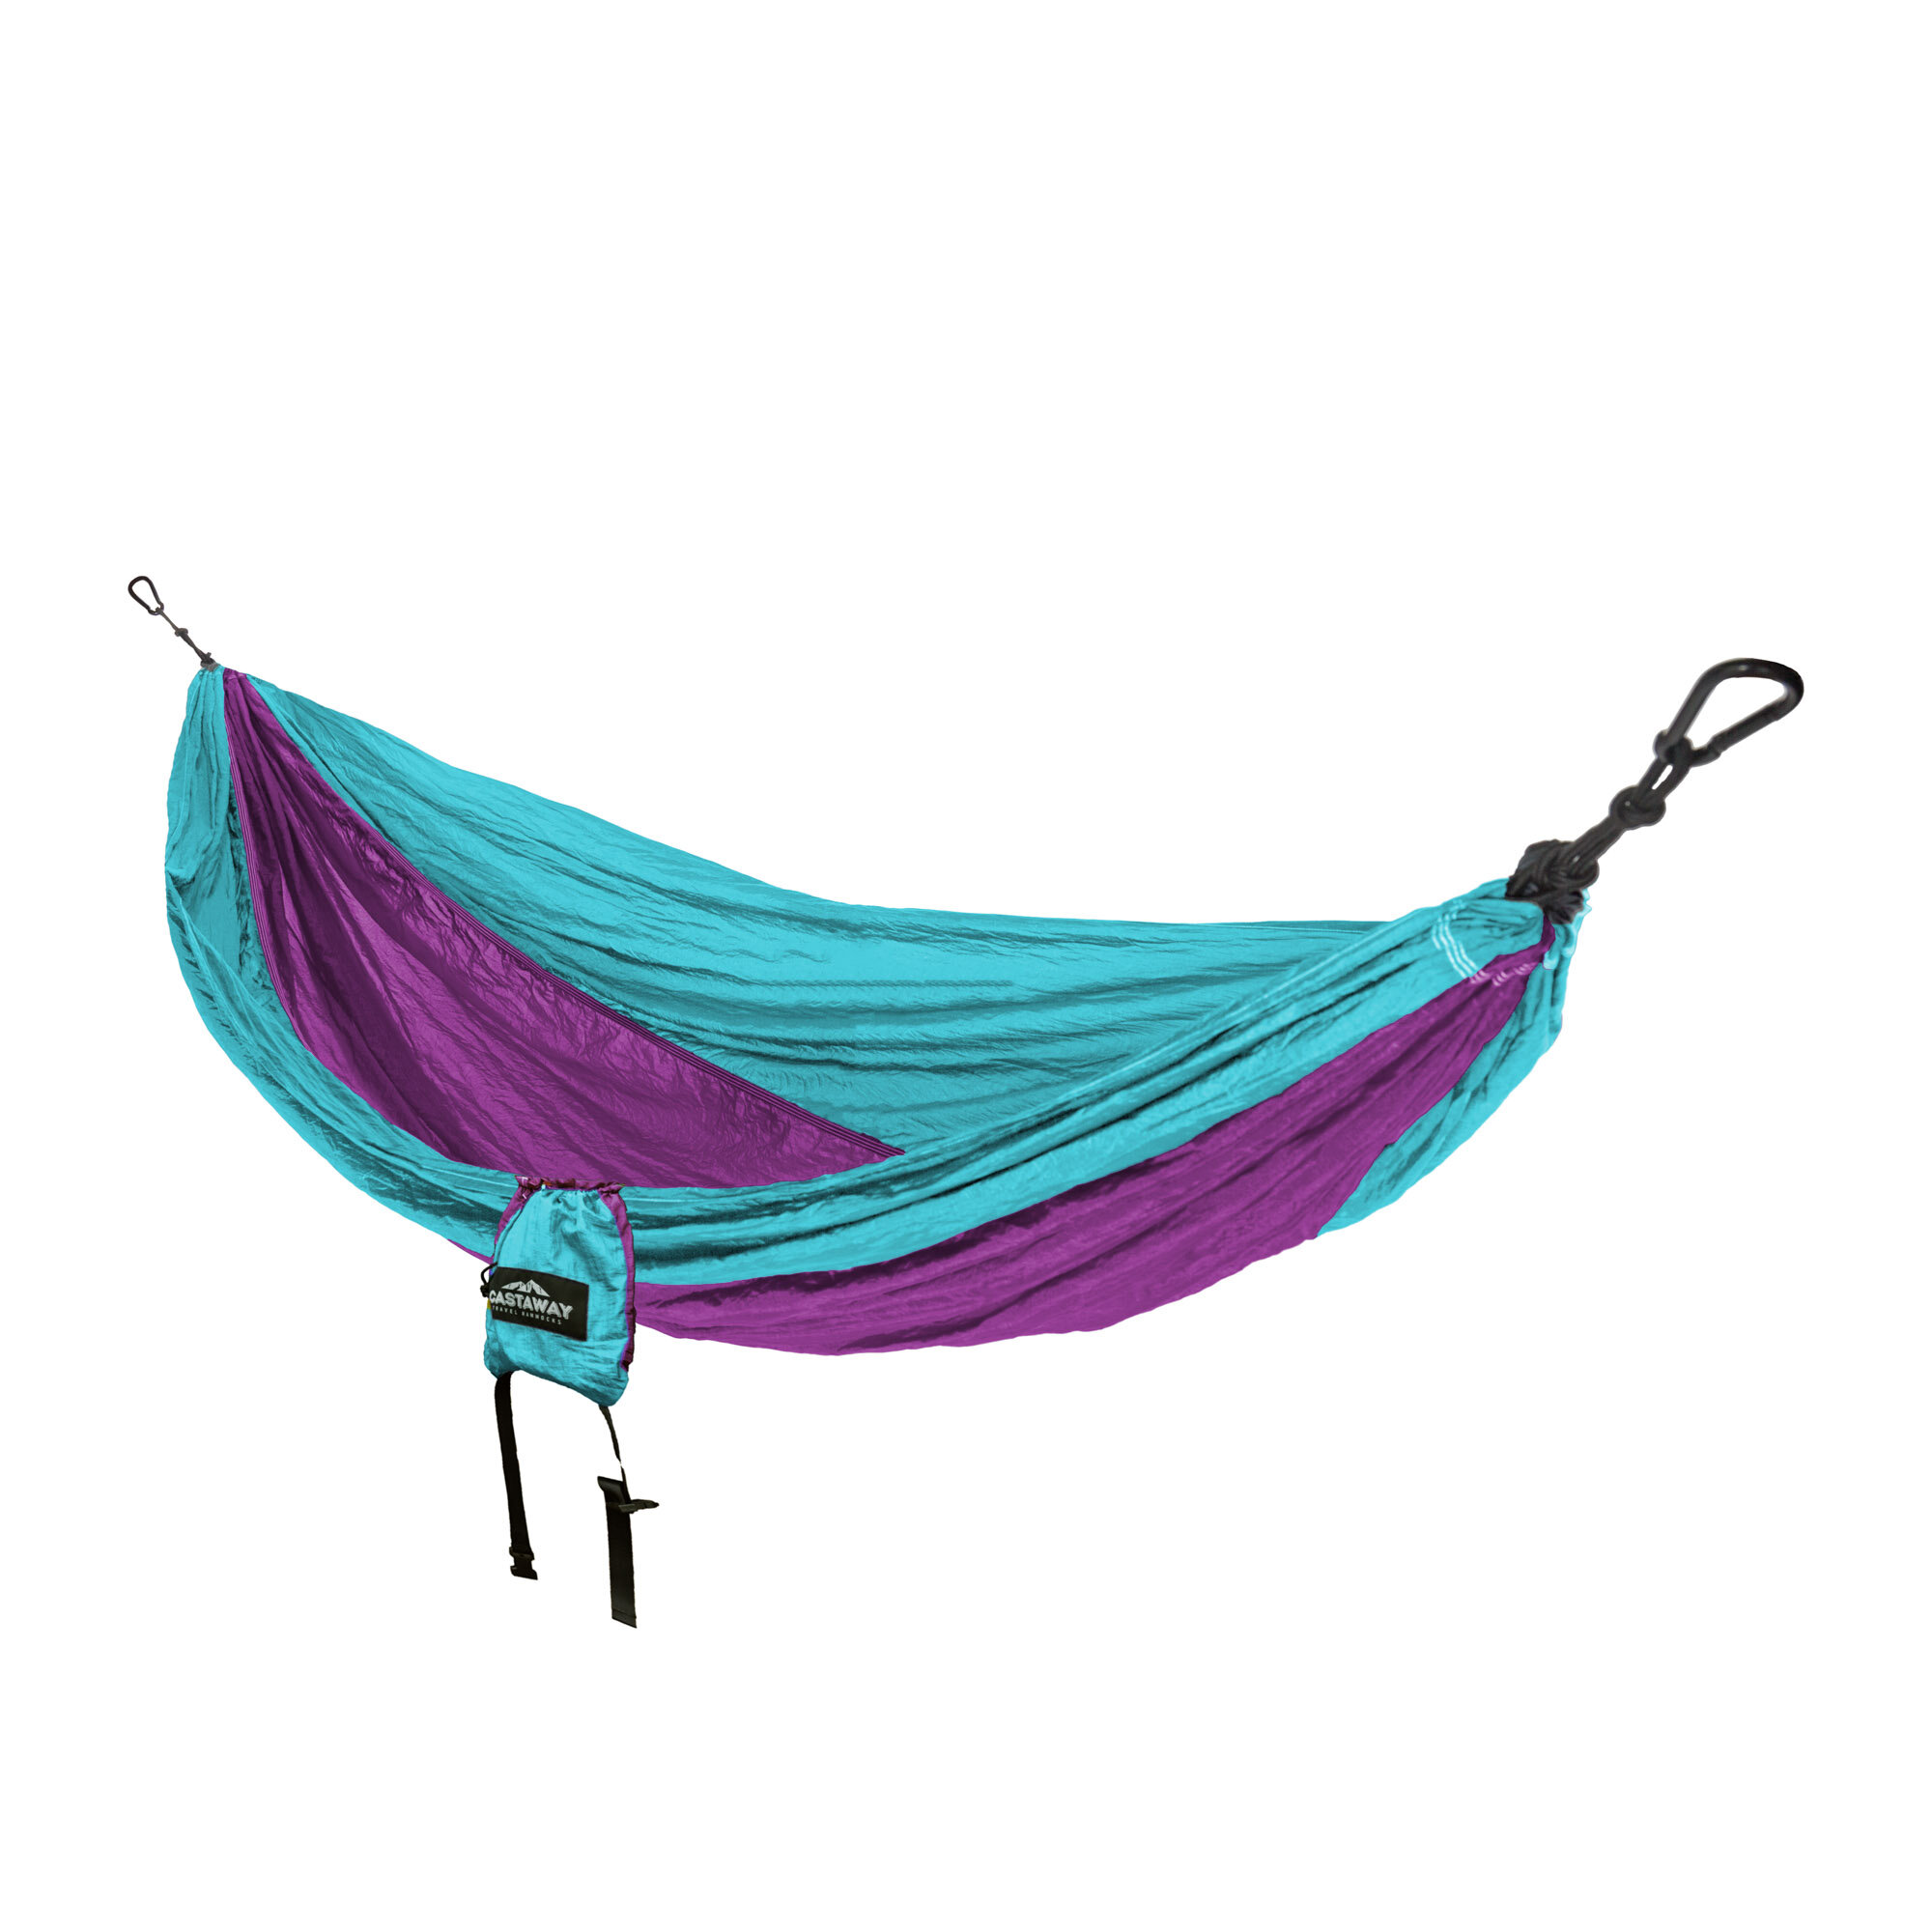 pinterest full best underquilt chrissscully hammock wl hammocks hangers images length on gear